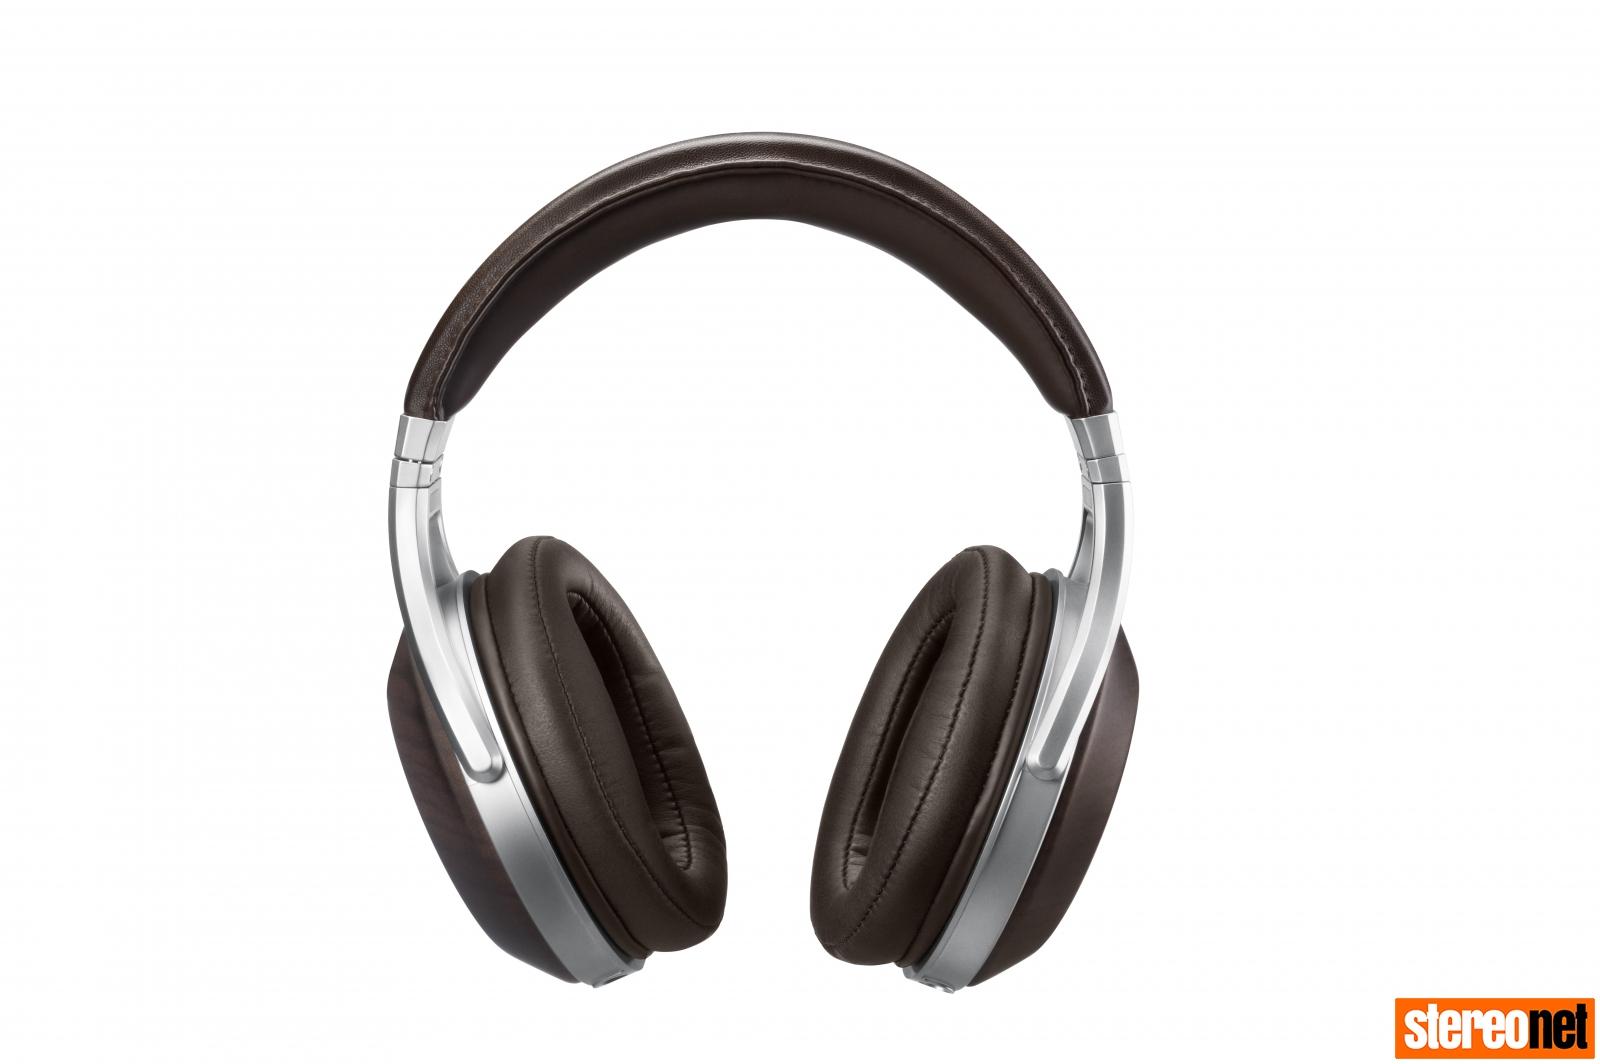 Denon AH-D5200 headphones